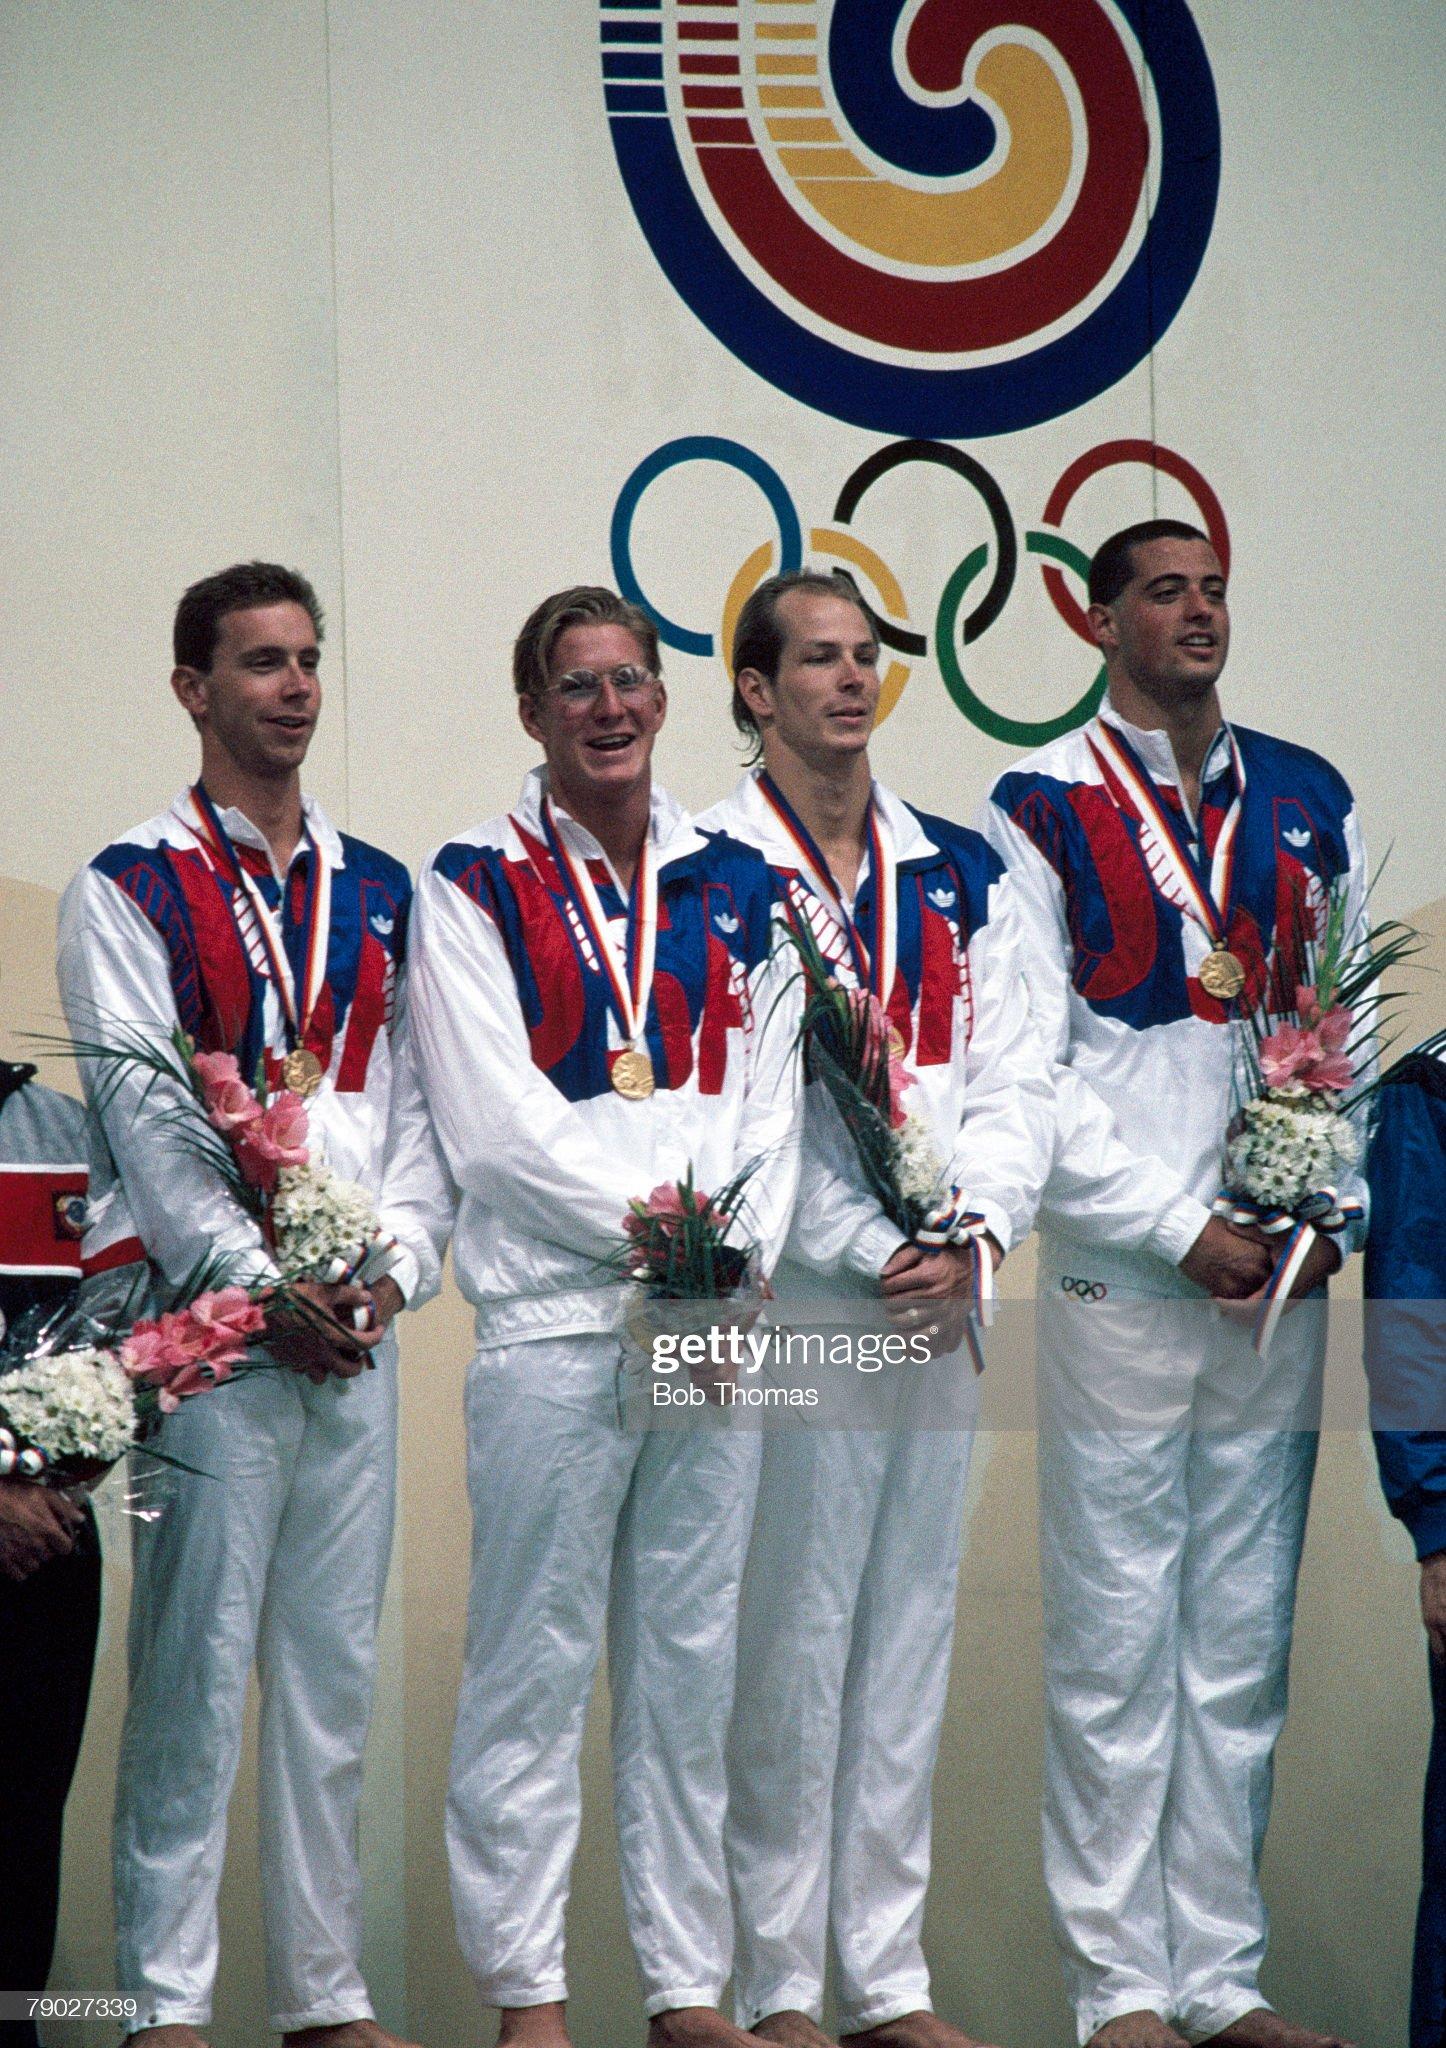 United States Swimming Team At XXIV Summer Olympics : Fotografía de noticias